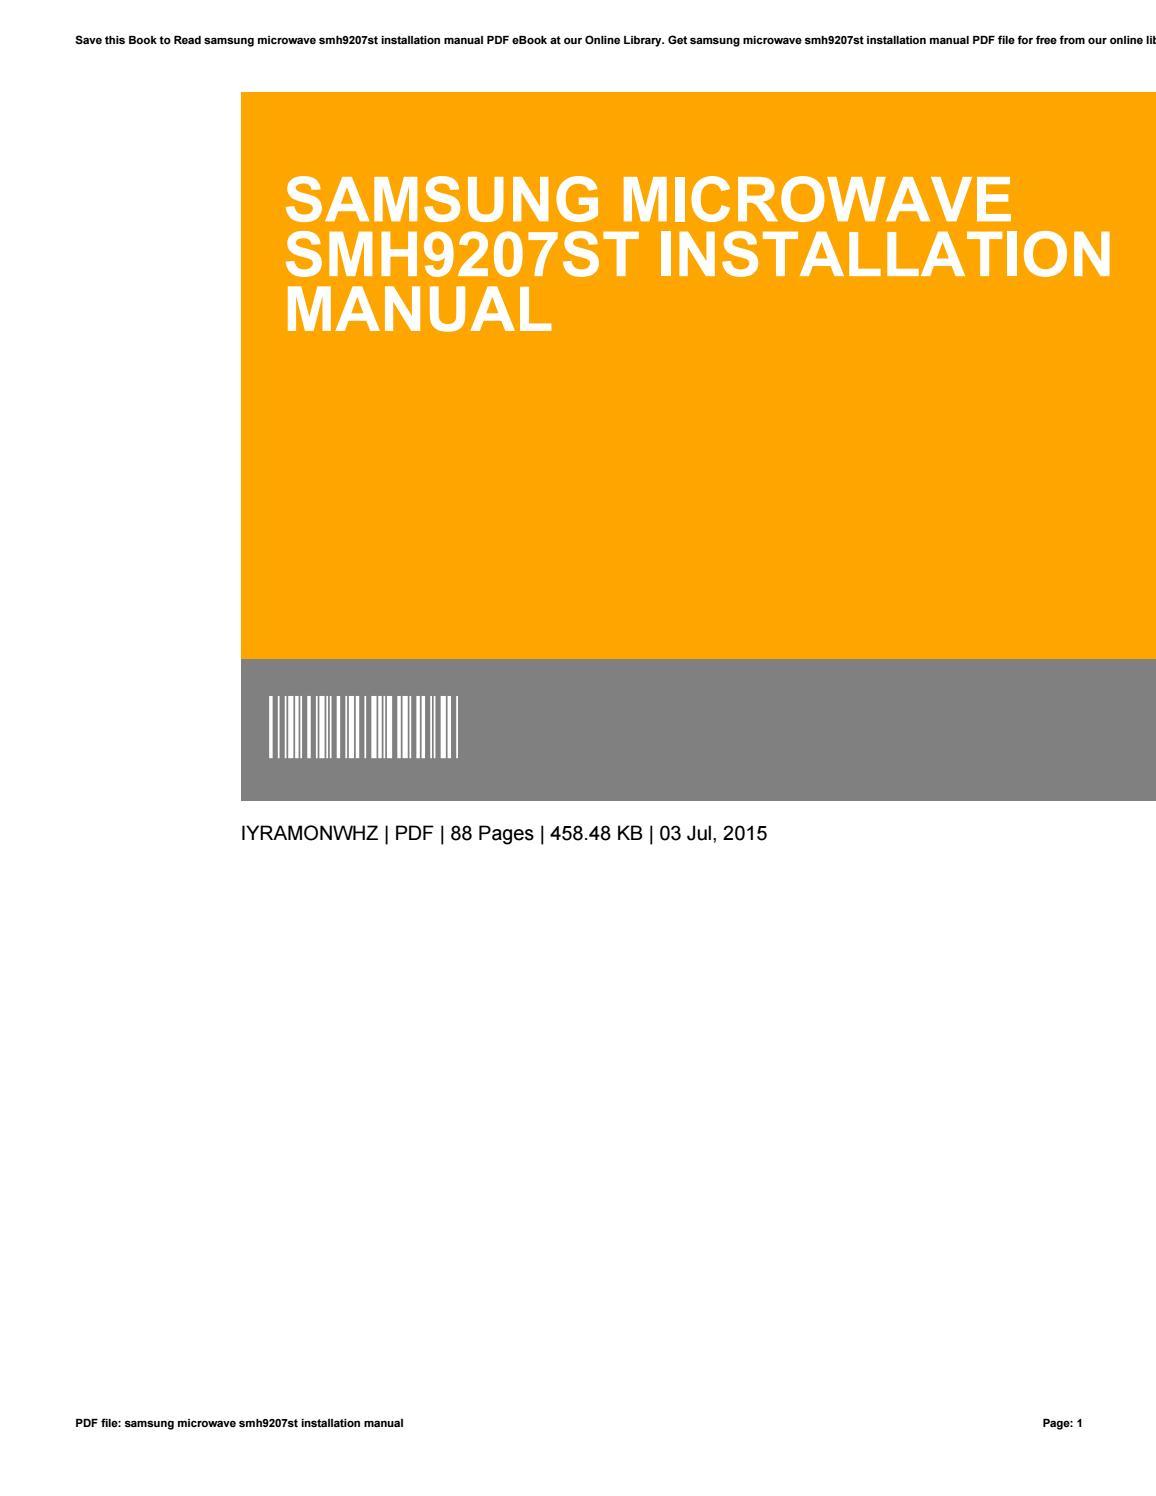 Samsung Microwave Smh9207stbestmicrowave